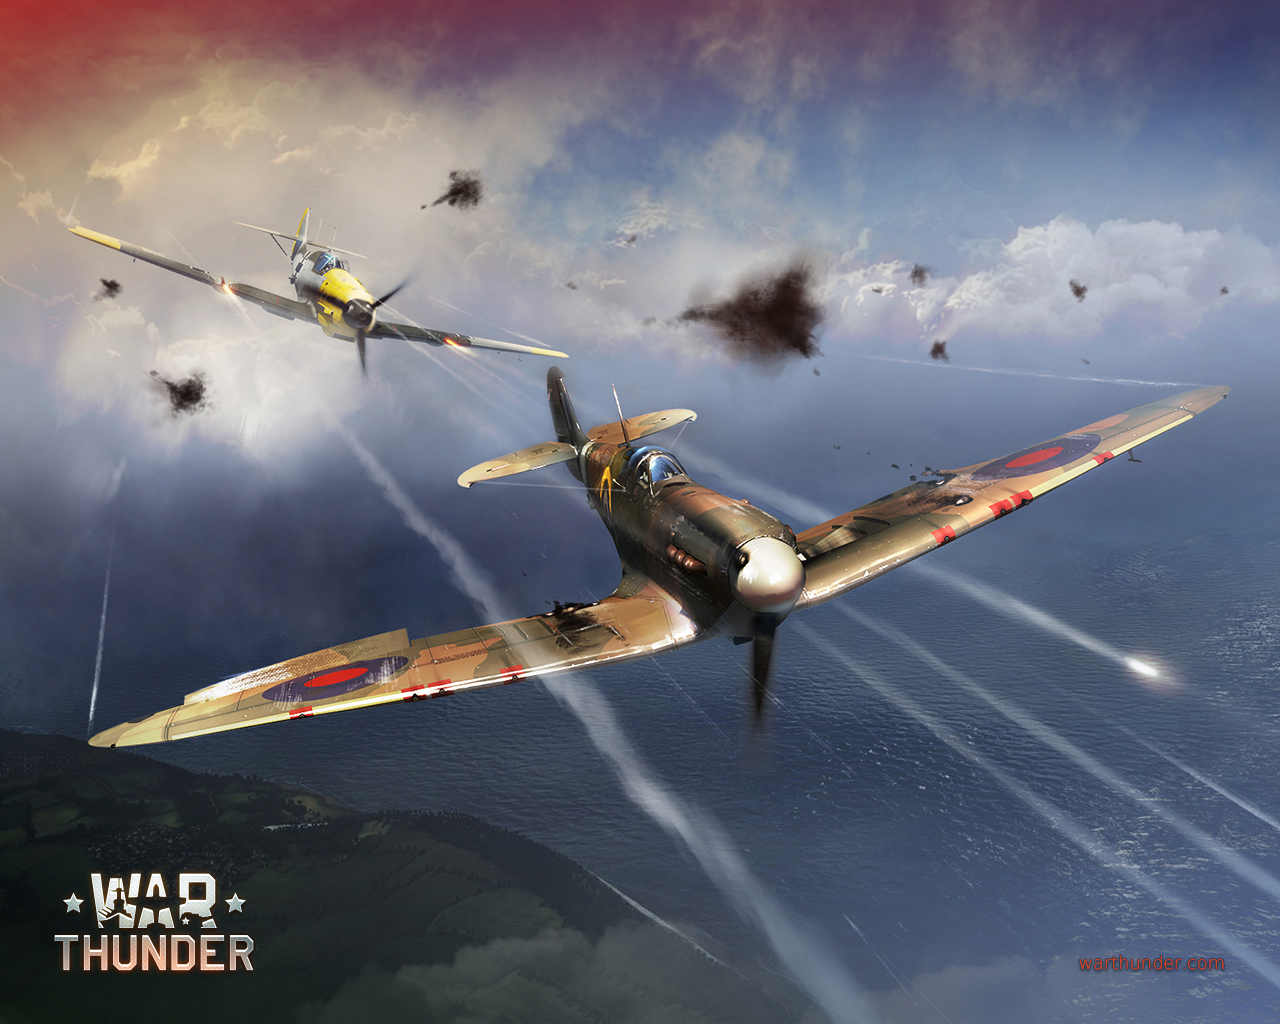 Обои Bf 109 k4, war, painting, german fighter, ww2, aviation. Авиация foto 16